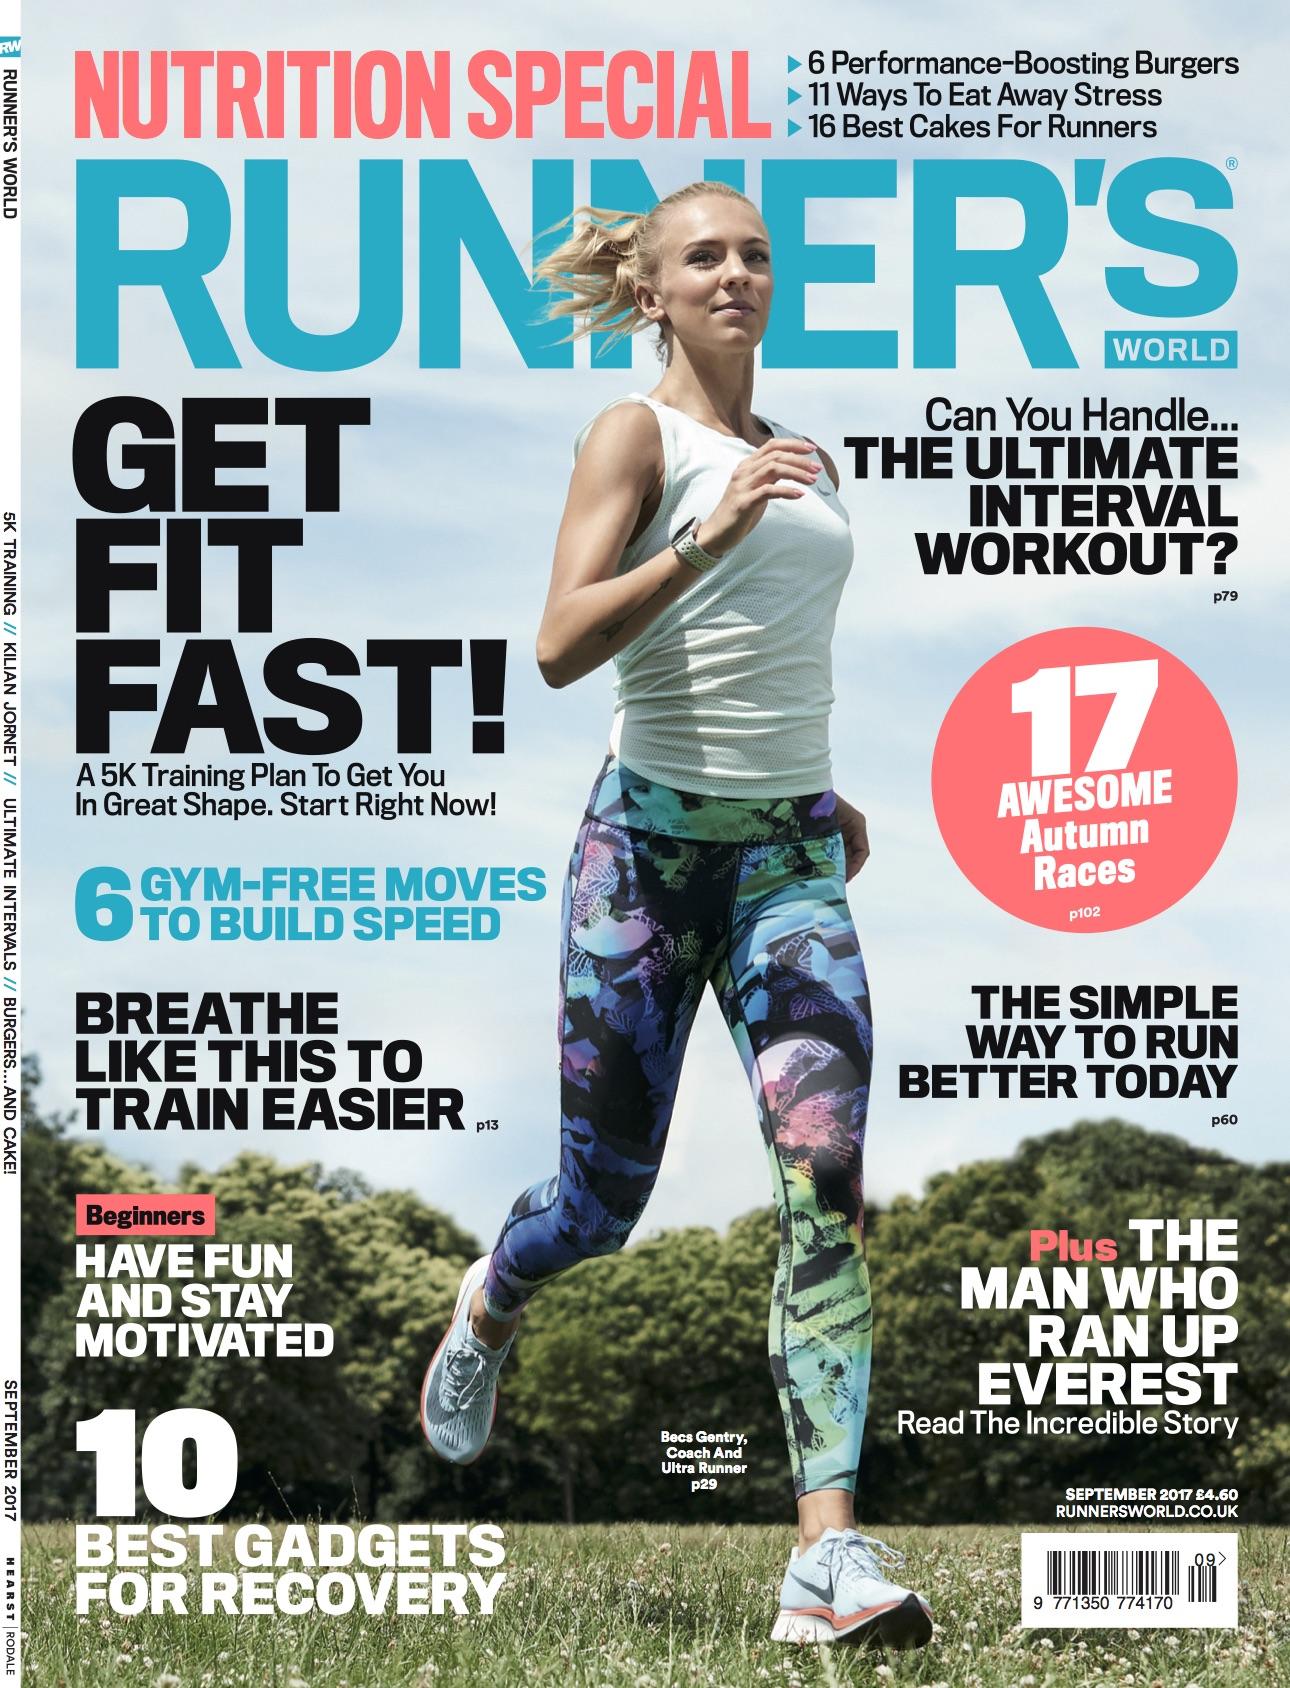 Nike + Run Ambassador & Marathon Runner Becs Gentry for Runner's World Cover - Hair & Makeup by Zuzana RitchiePhoto: Duncan Nichollswww.duncannicholls.co.uk